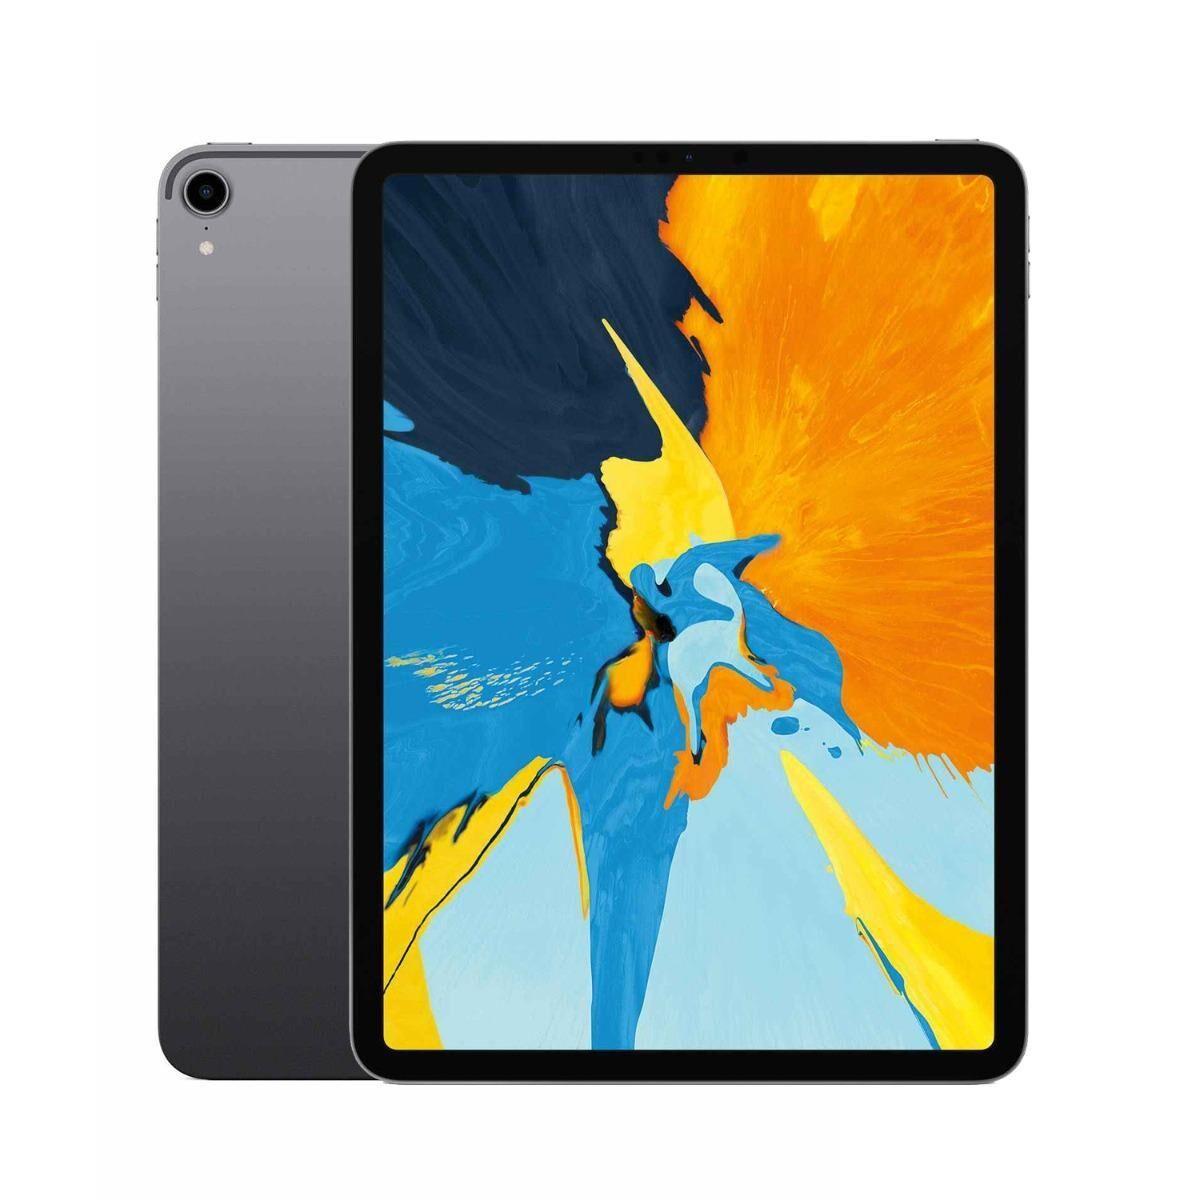 Apple Tablet Apple iPad Pro 11 (2018) 1TB LTE - Grey